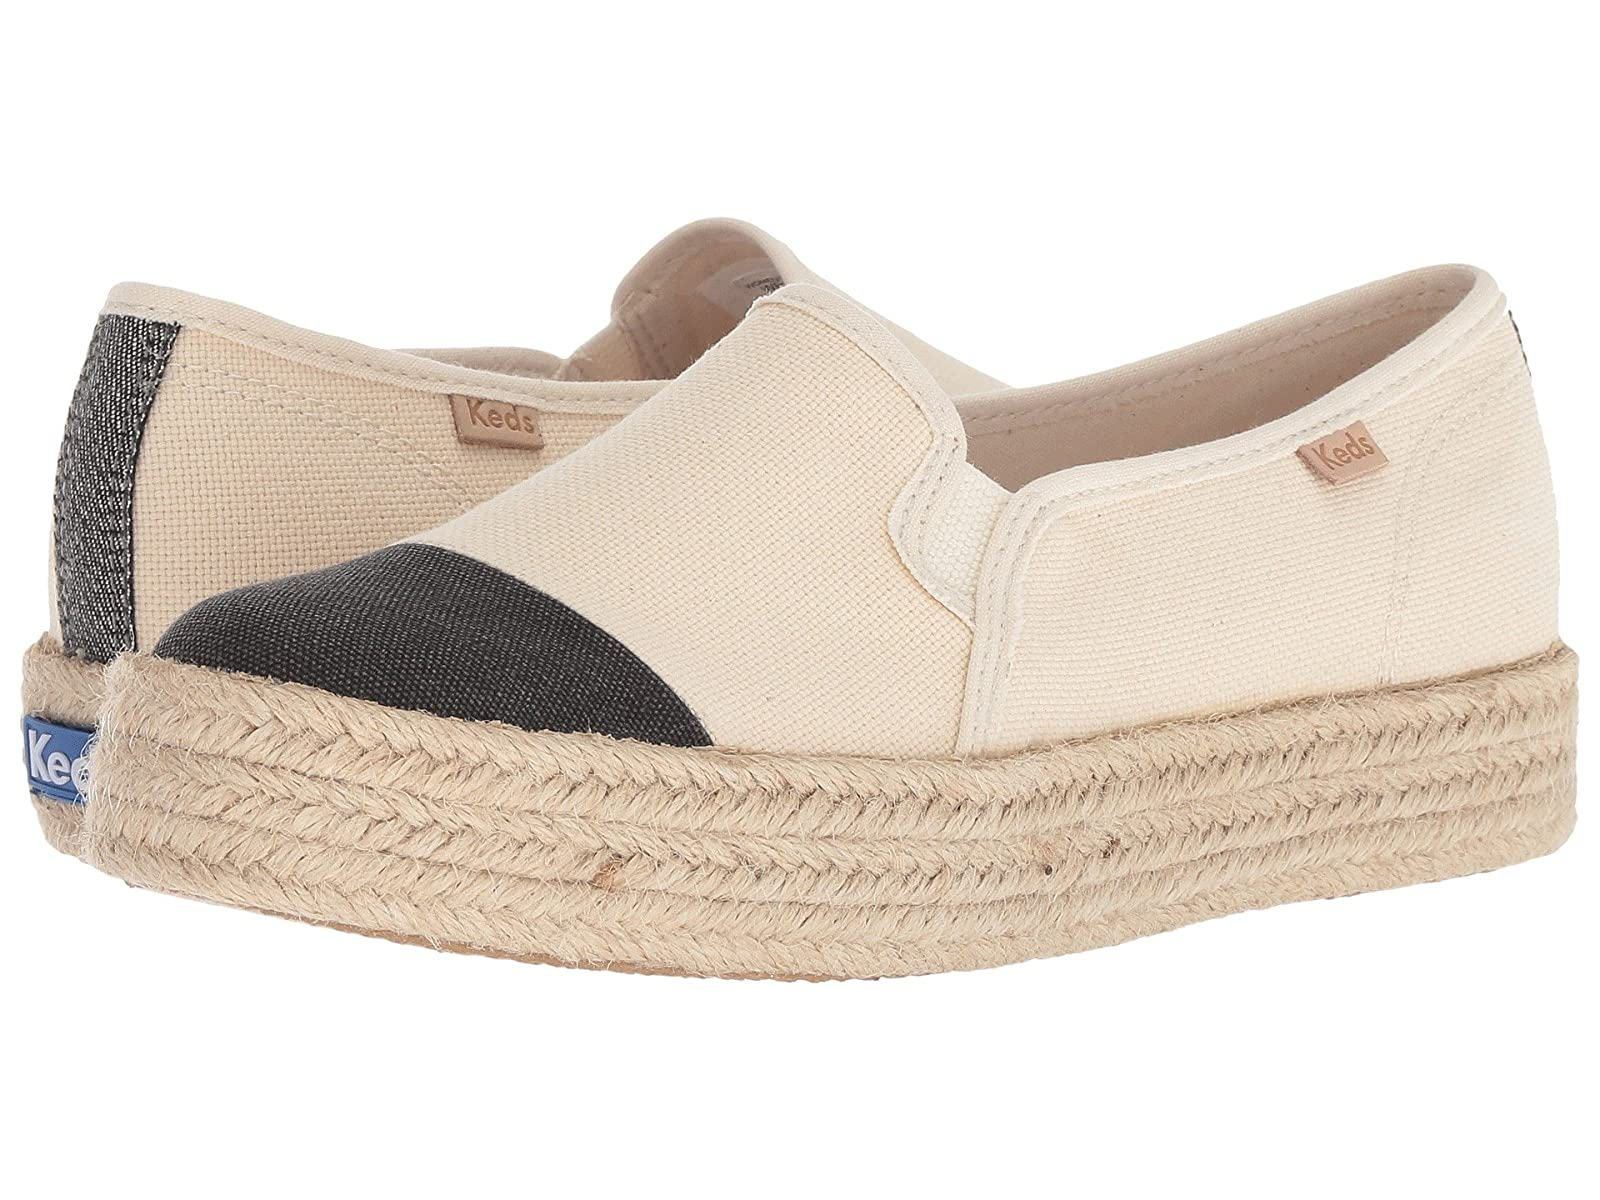 Keds Keds X Design Love Fest Triple Decker Slip-on SneakerAtmospheric grades have affordable shoes